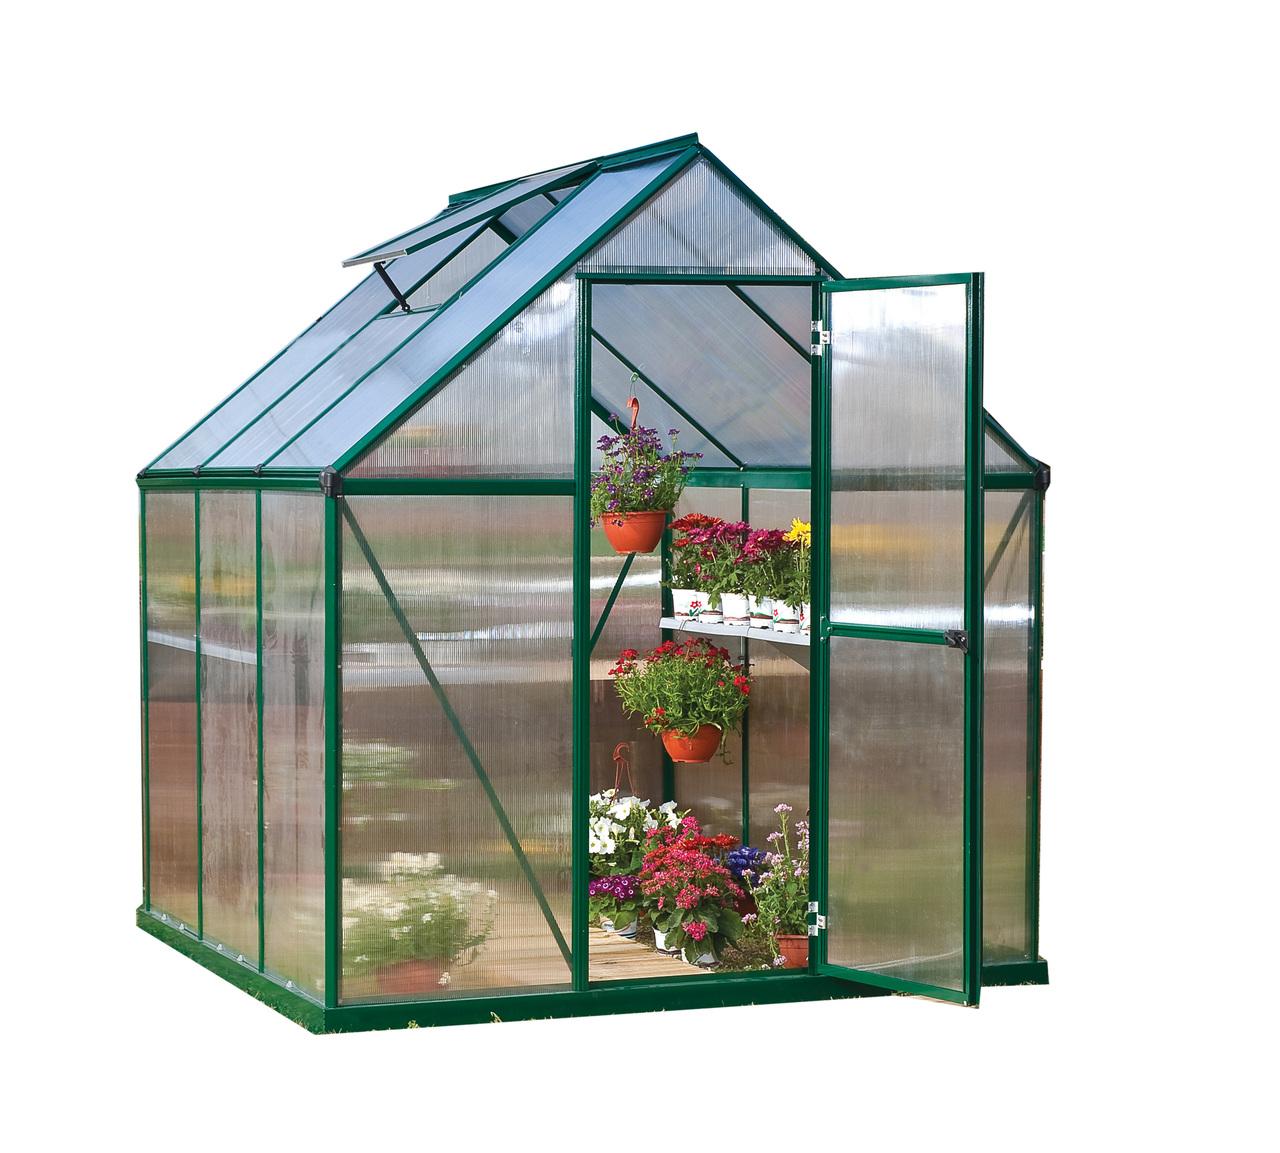 Mythos 6' x 6' Hobby Greenhouse, Green